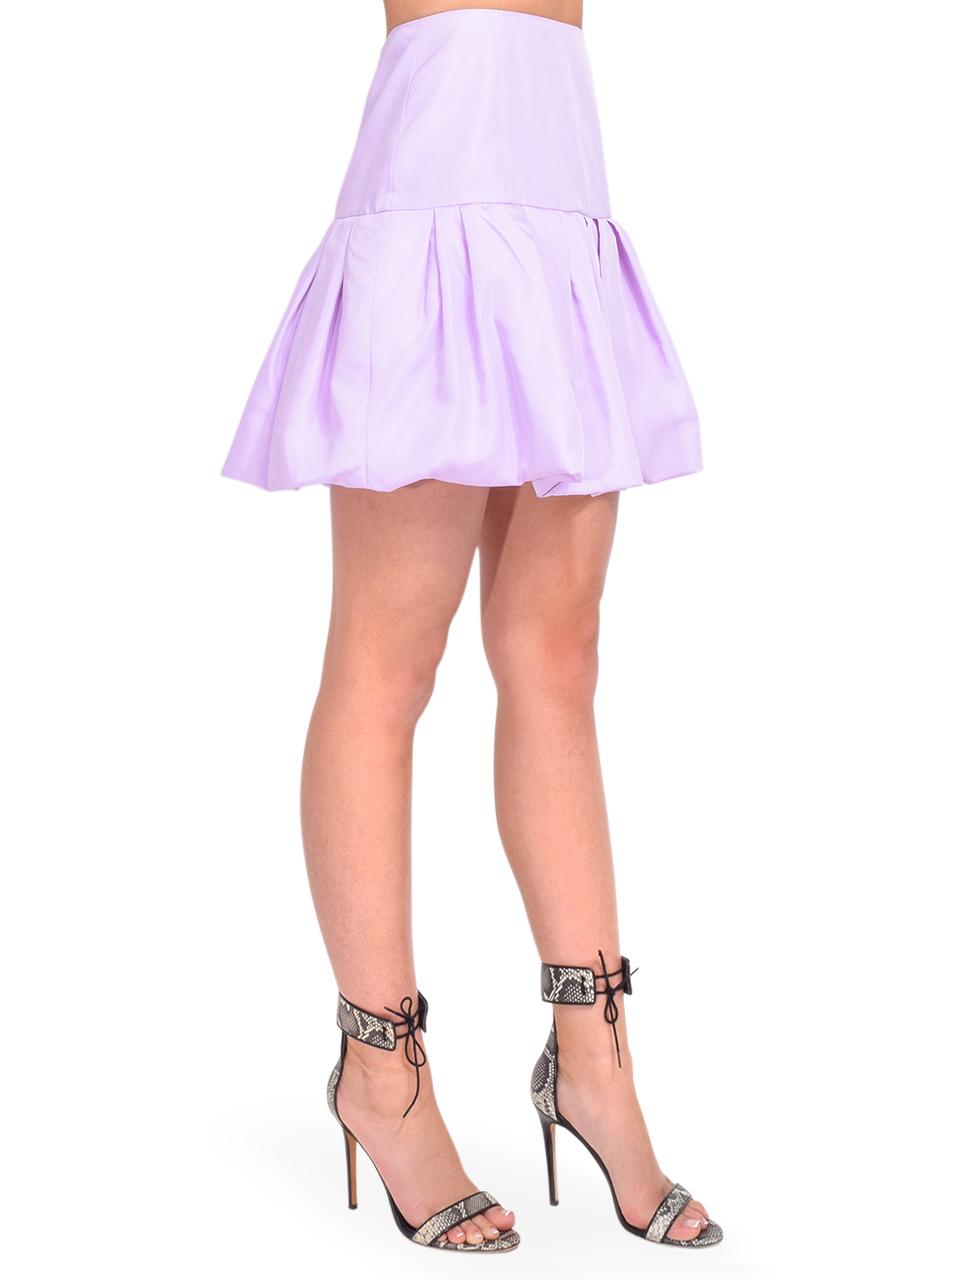 3.1 Phillip Lim Bubble Hem Taffeta Mini Skirt in Lavender Side View